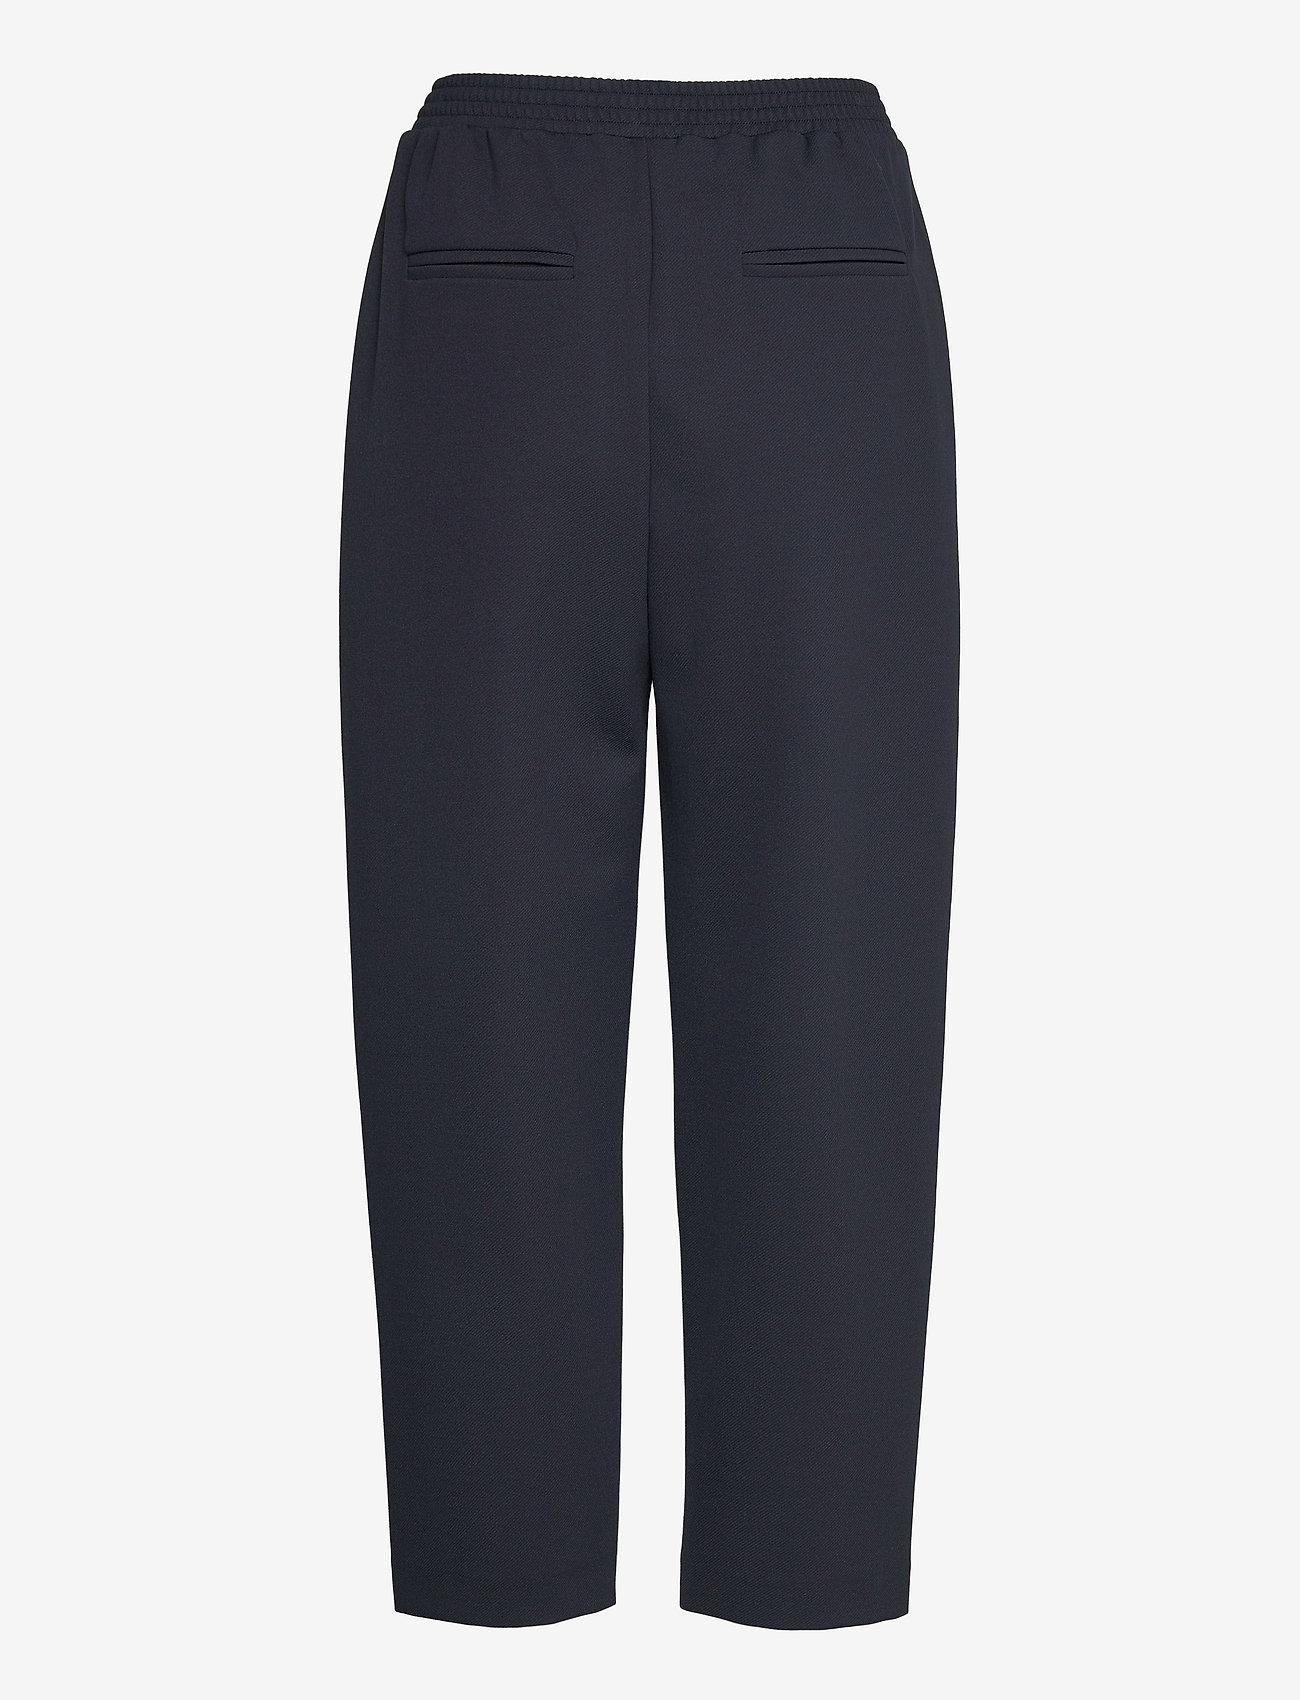 Max Mara Leisure - MILENA - wide leg trousers - navy - 1